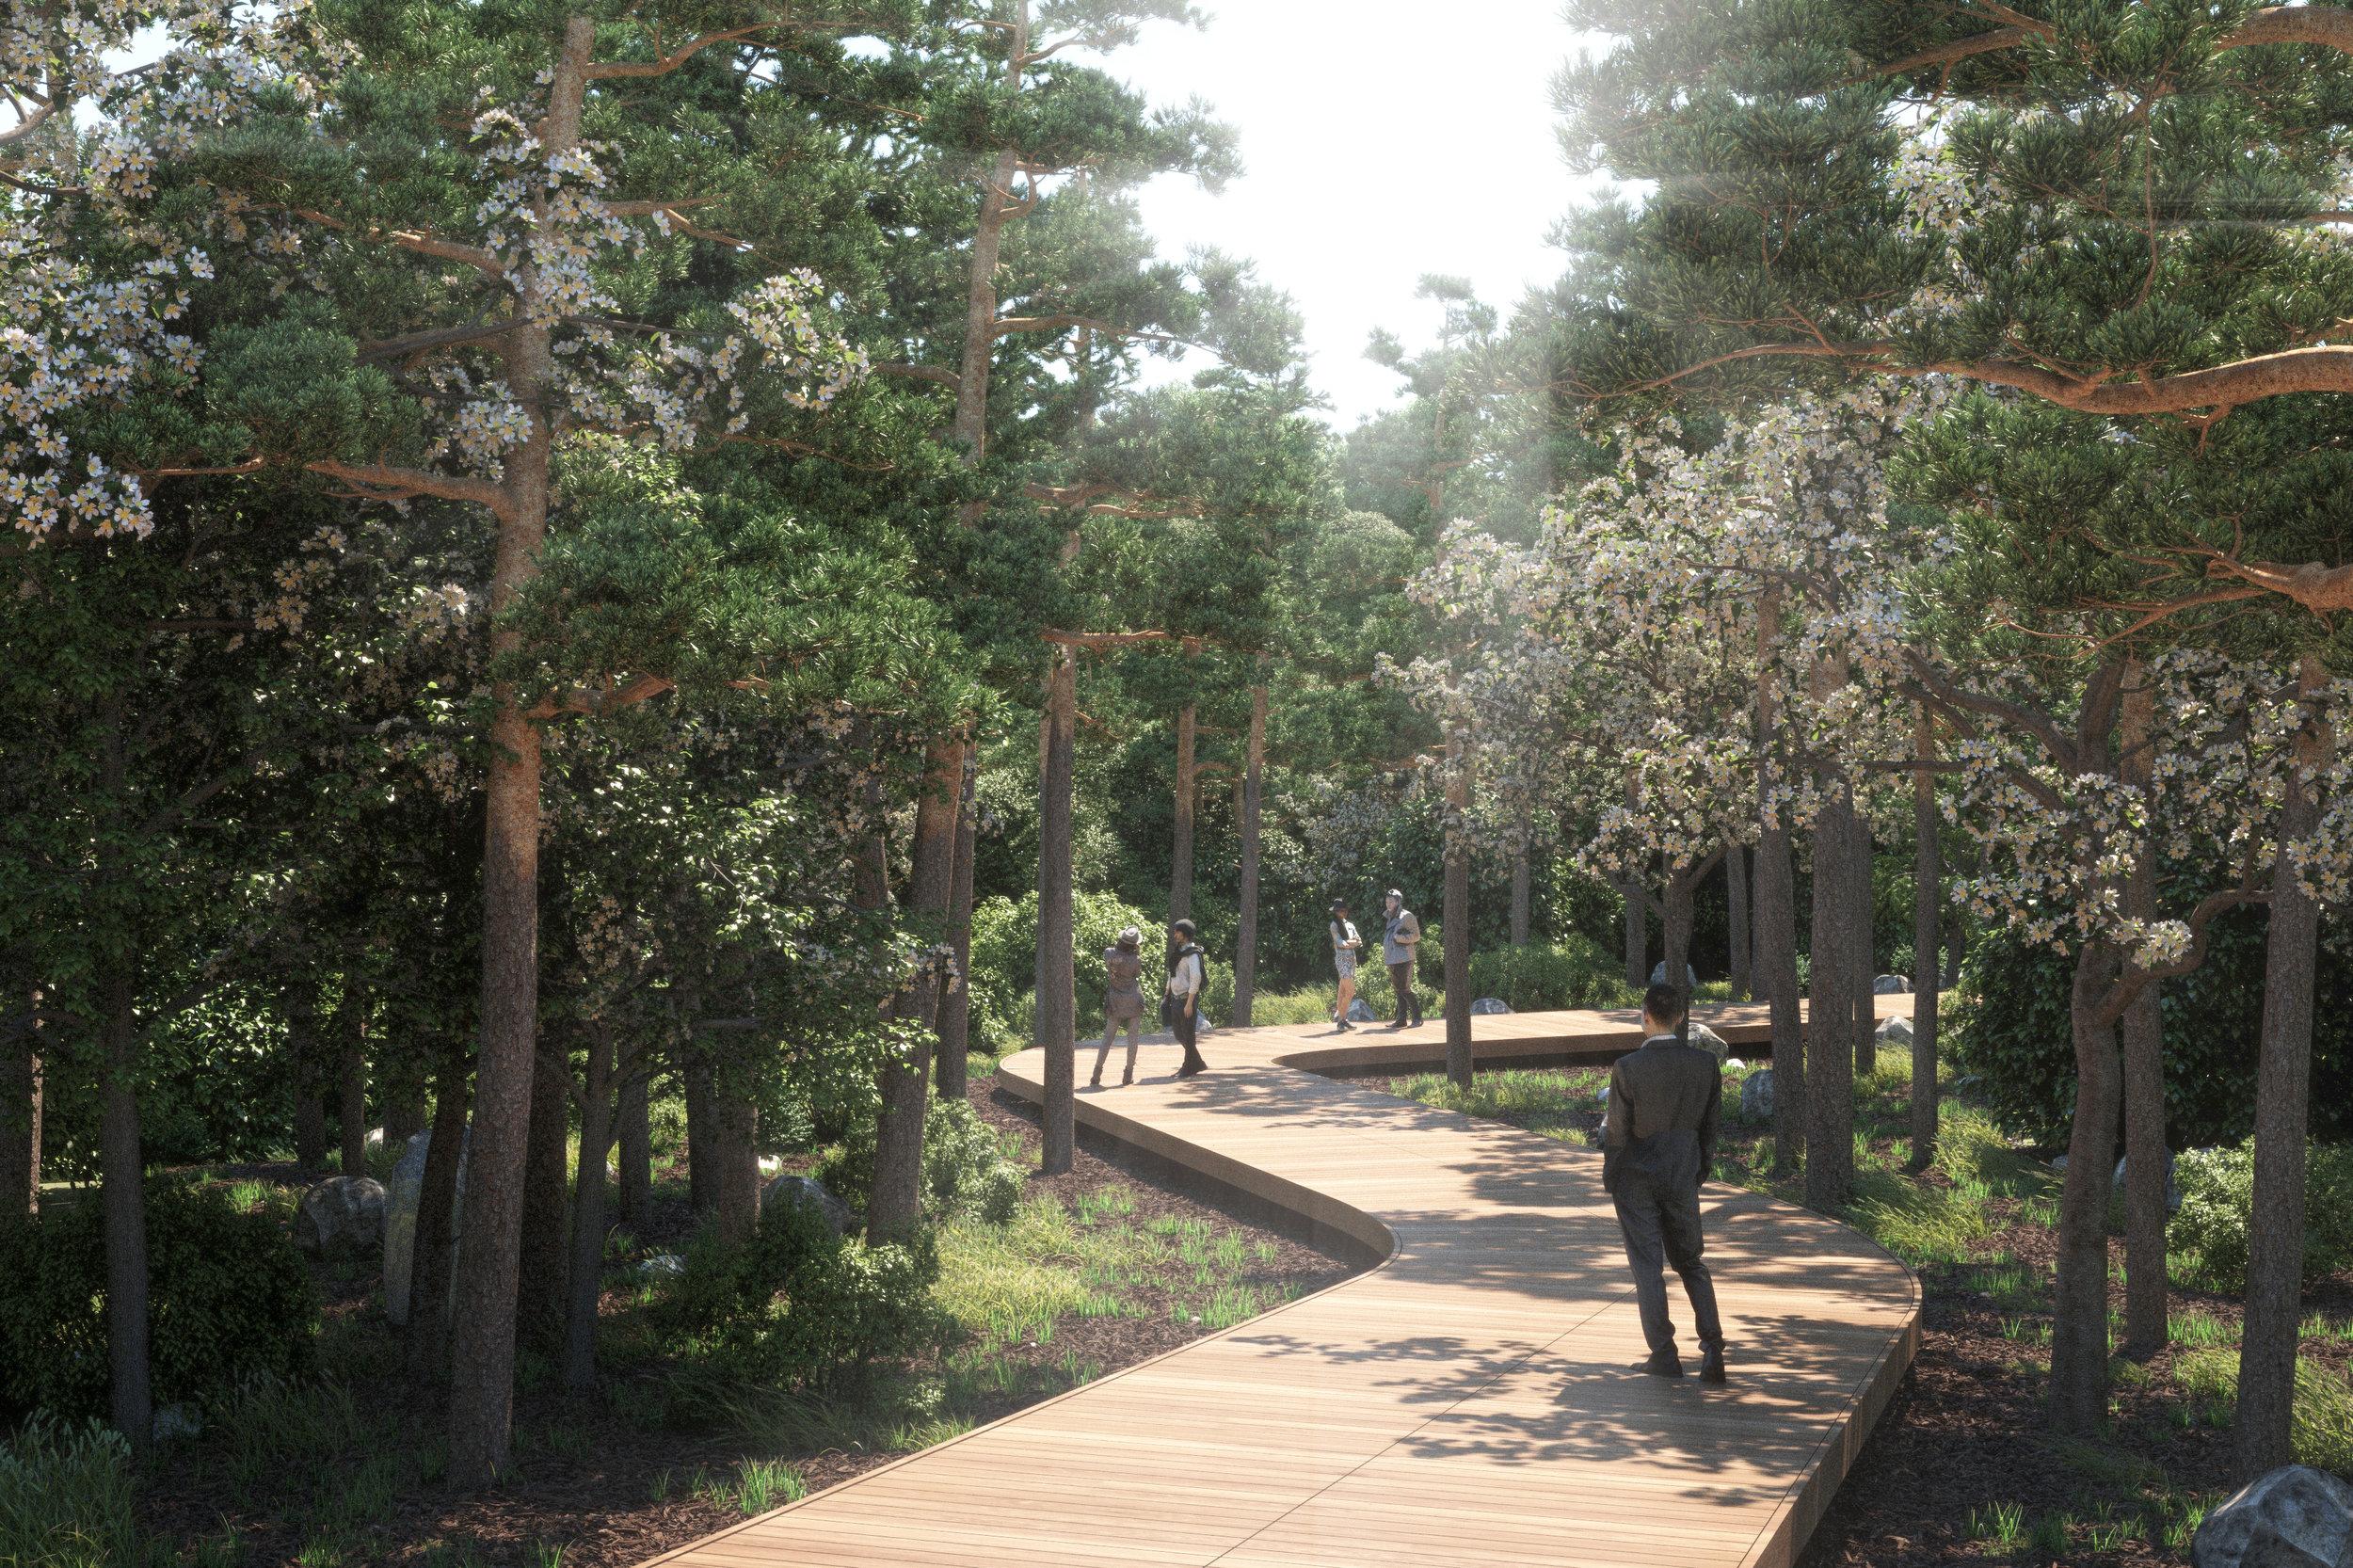 footpaths in forest.jpg